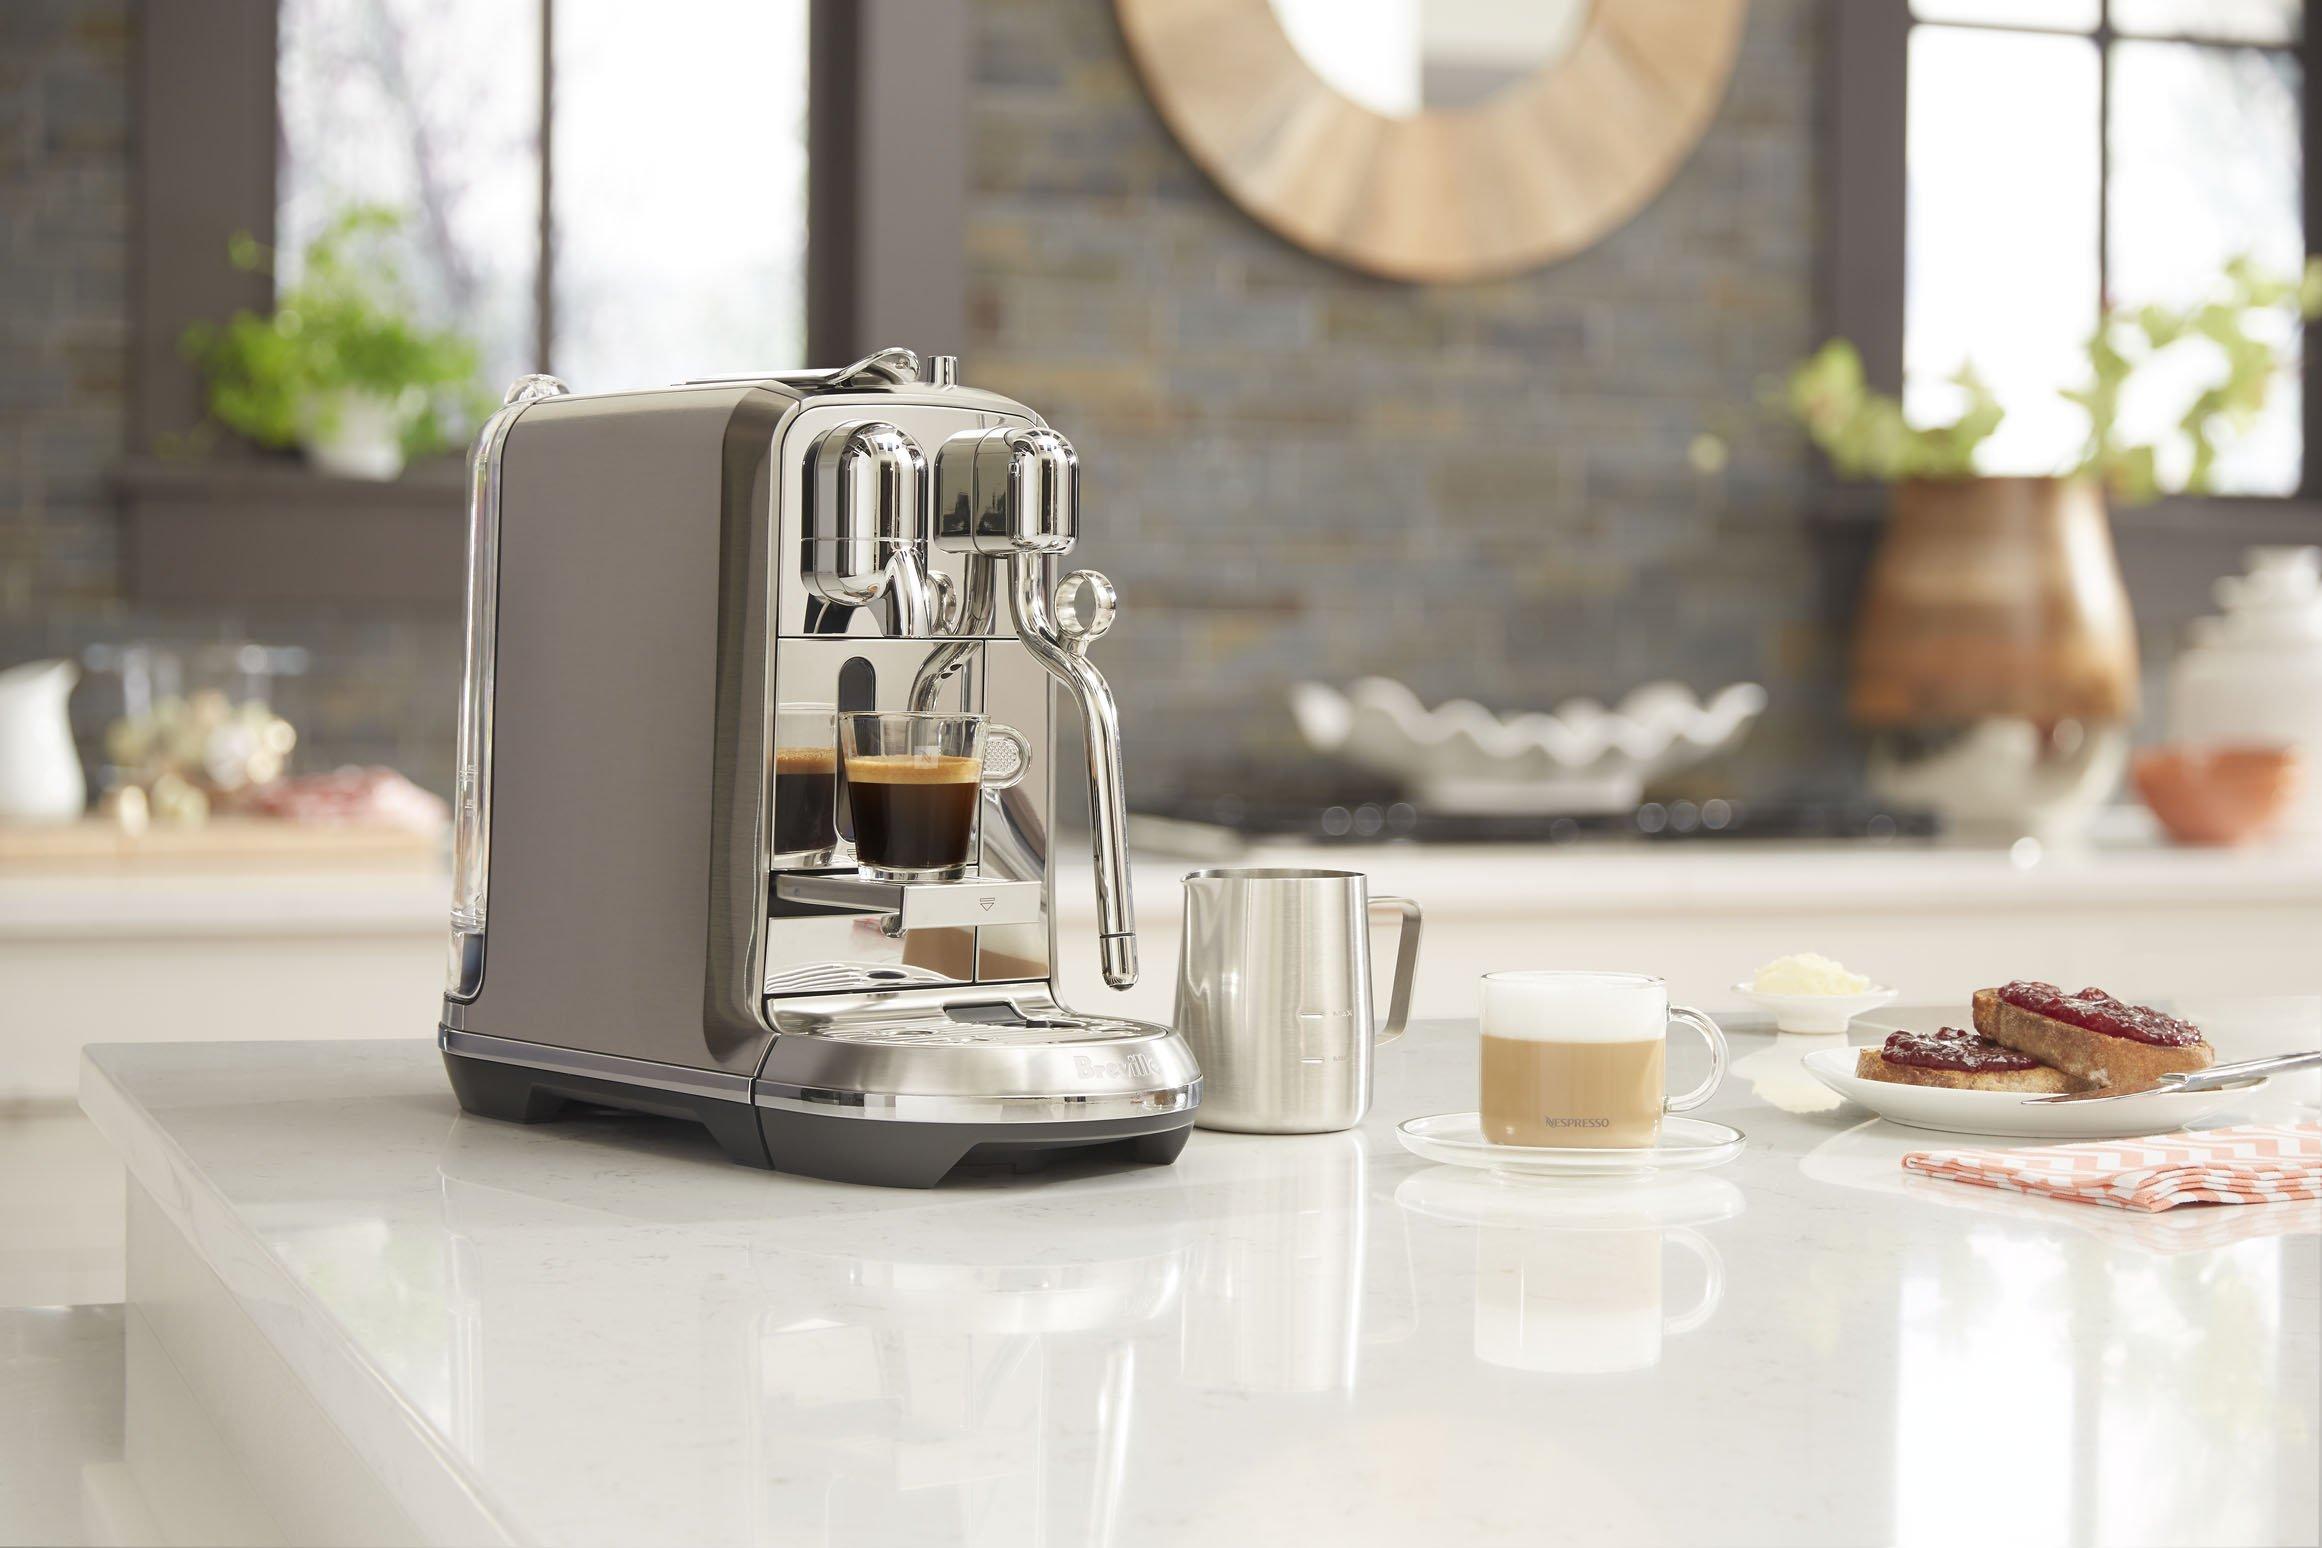 Breville BNE800BSS Nespresso Creatista Plus, Stainless Steel by Breville